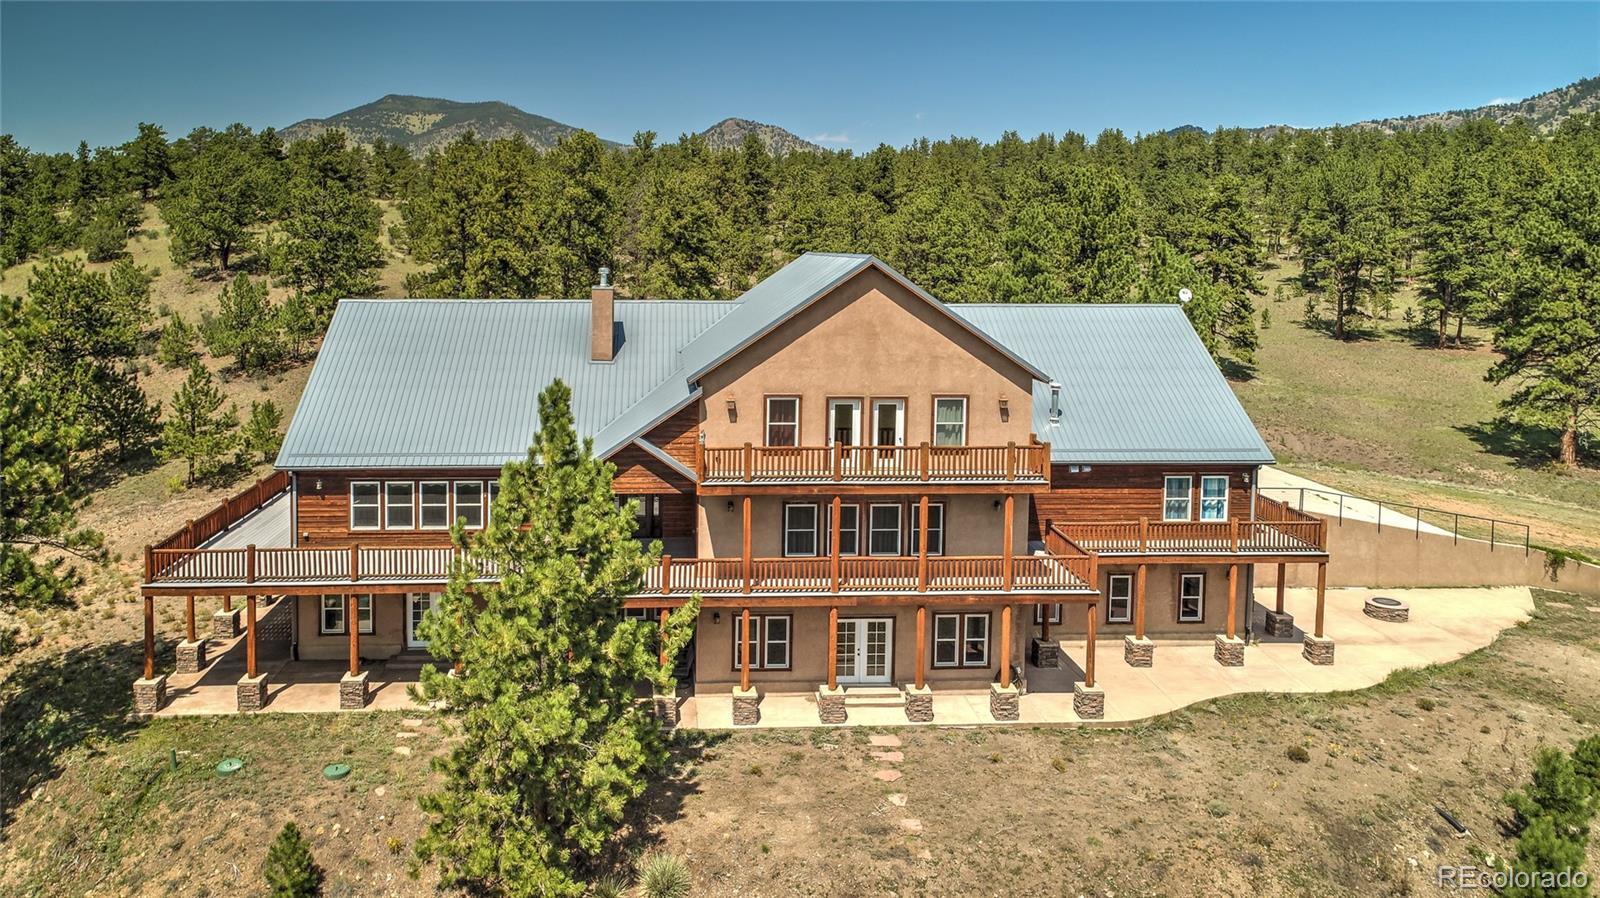 750 Old Kathleen Trail, Guffey, CO 80820 - Guffey, CO real estate listing